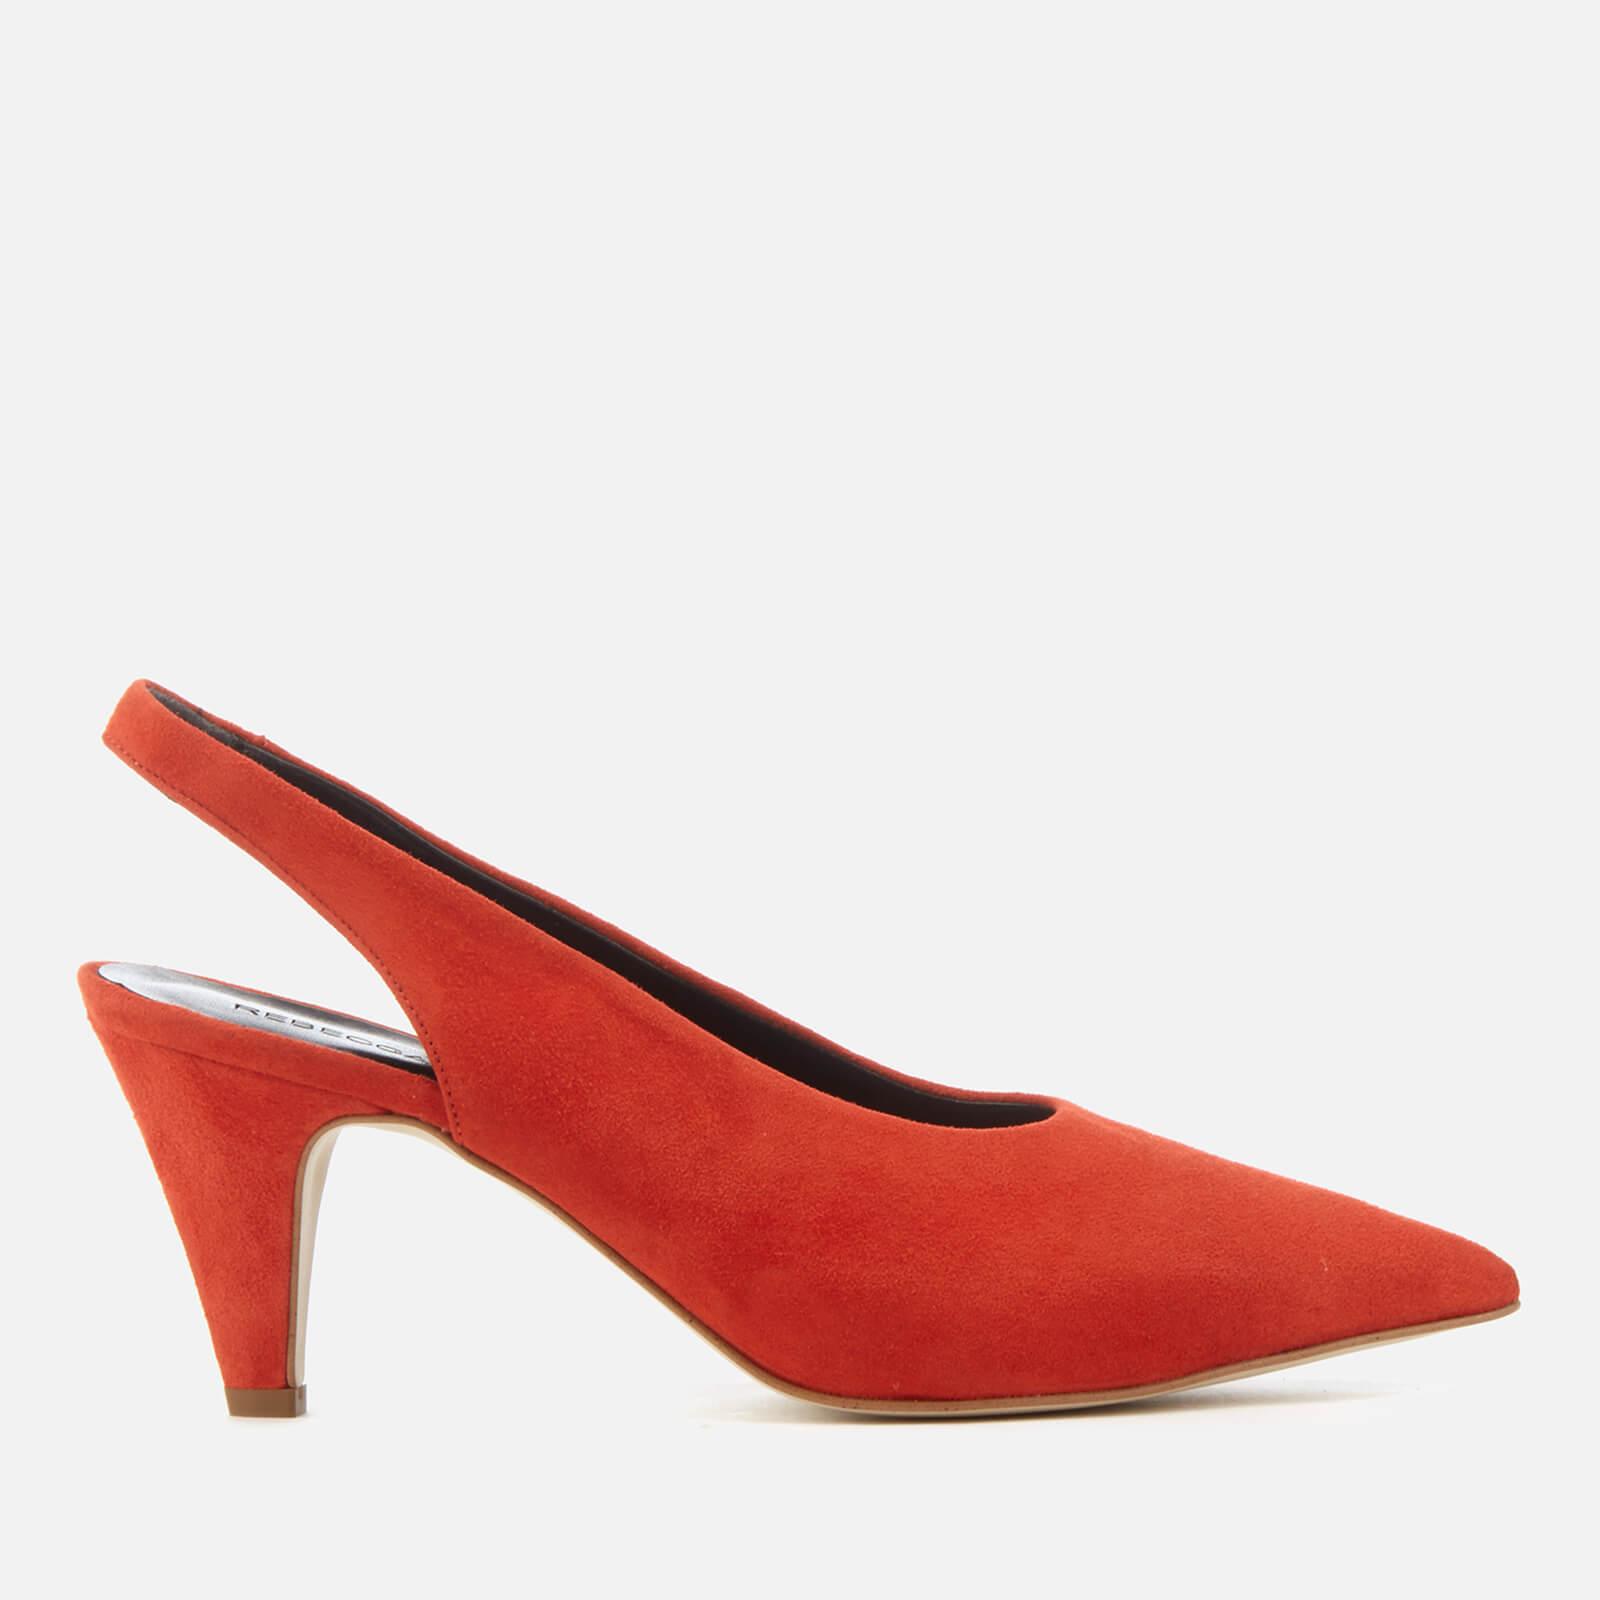 Rebecca MinkoffSIMONA - Classic heels - red zFvyXOuwr0